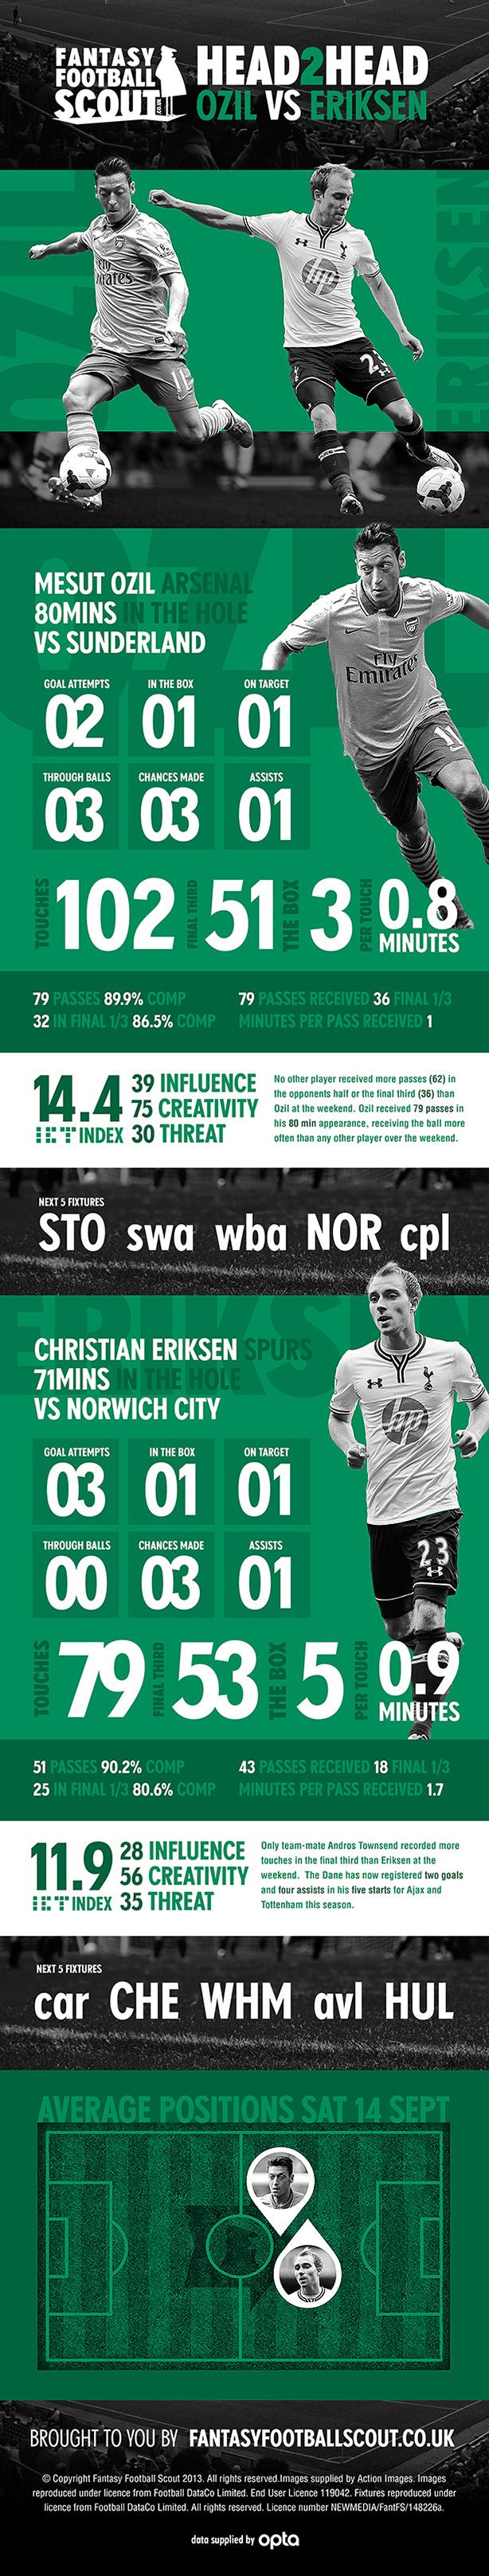 Infographic - Head to Head - Ozil vs Eriksen